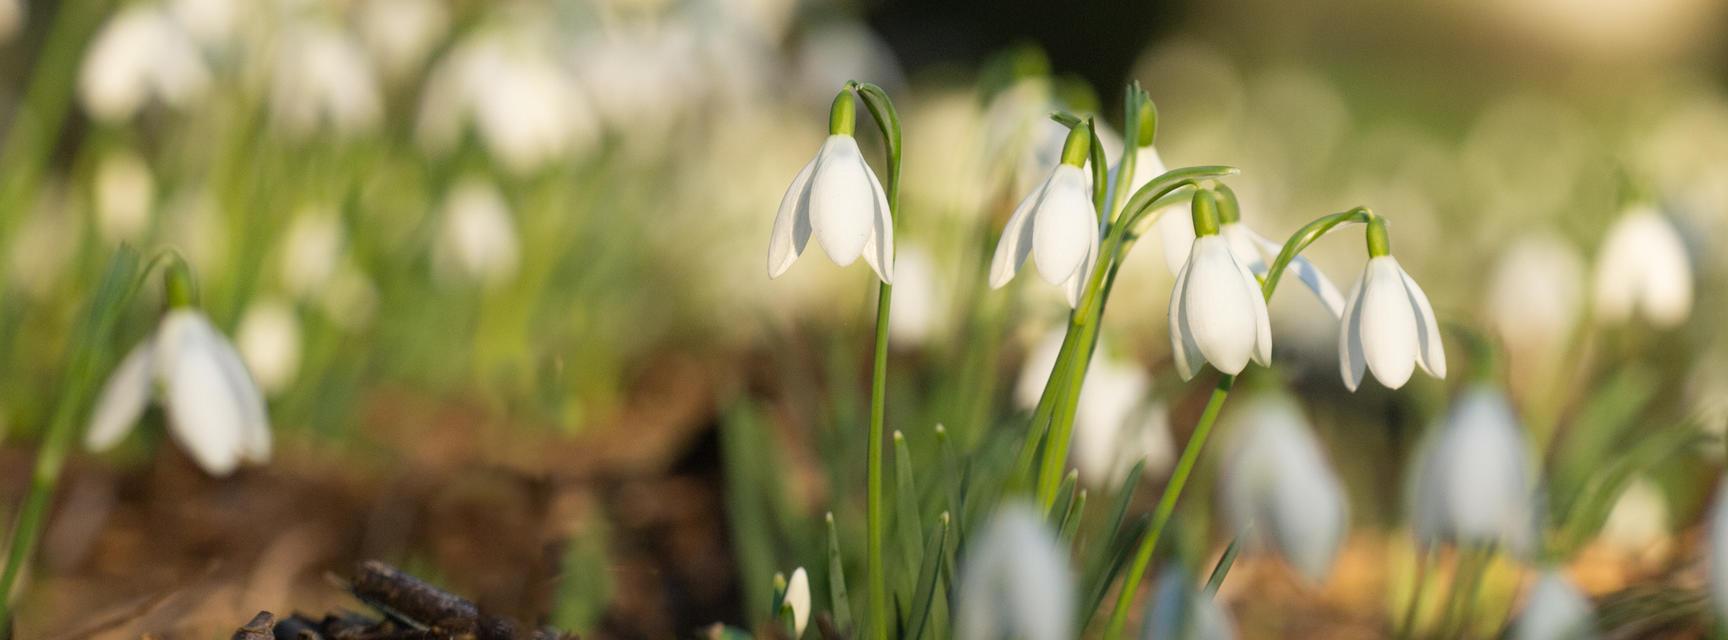 Snowdrops - Oxford Botanic Garden